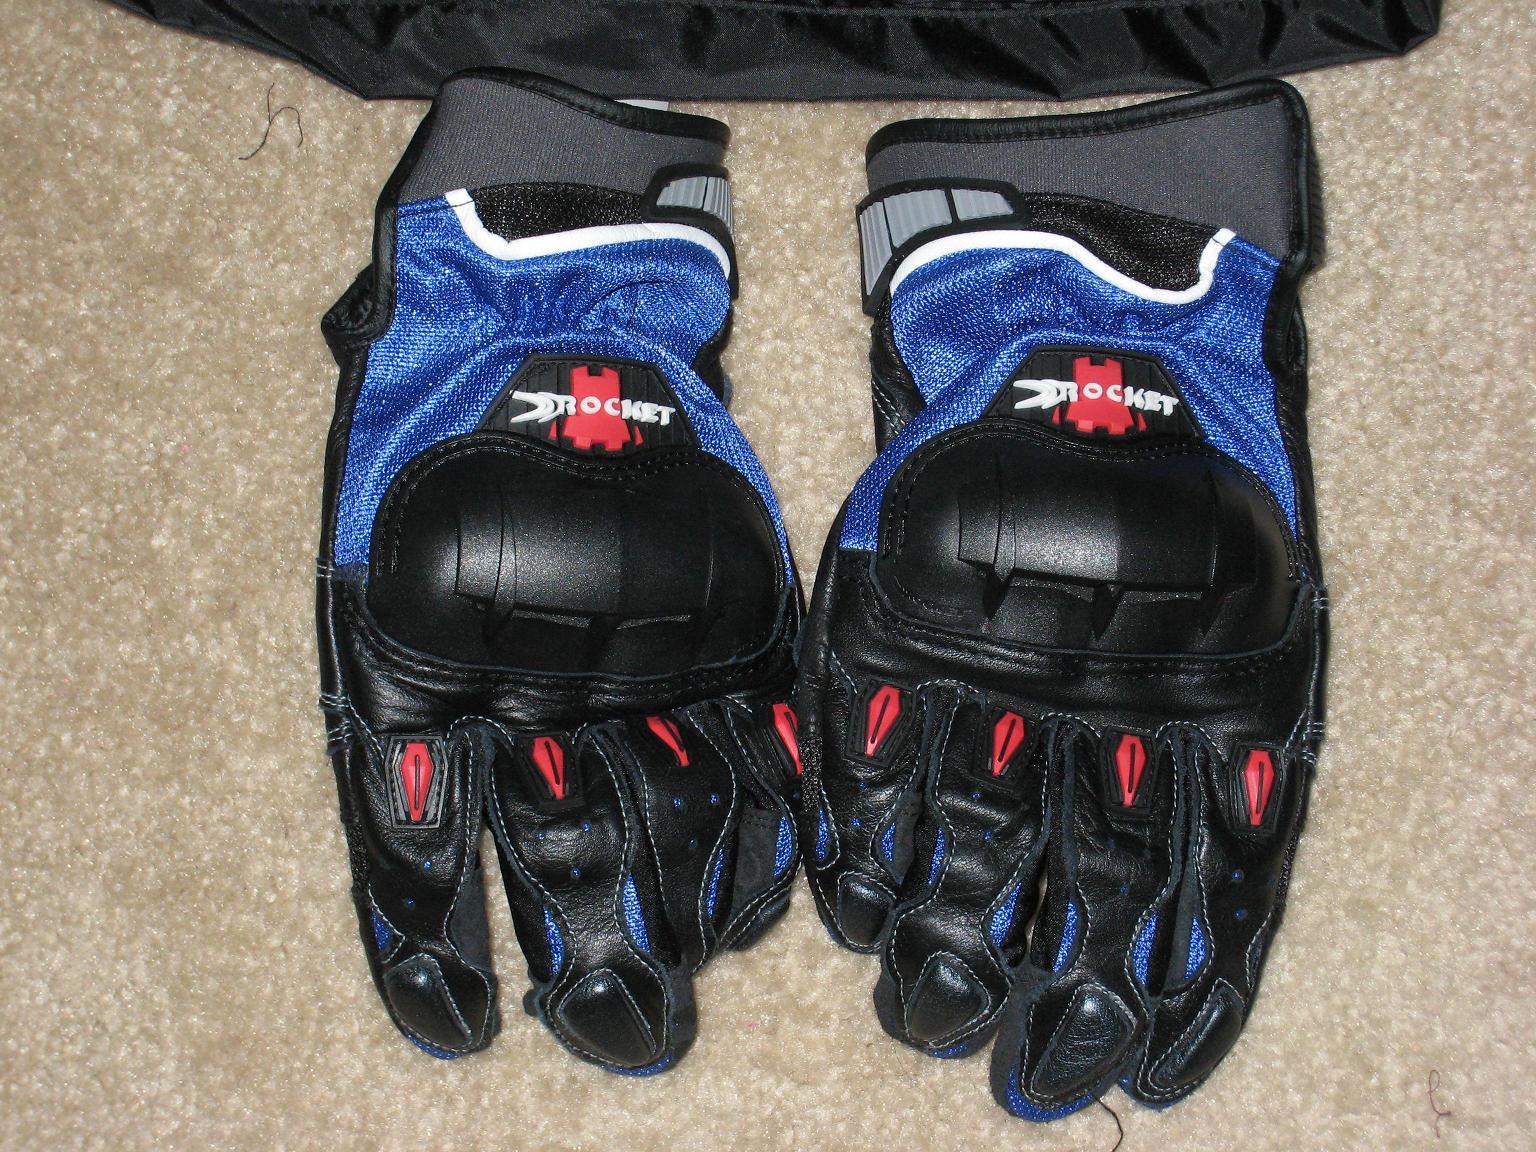 Joe rocket leather motorcycle gloves -  Leather Gloves 10459 Fs New Joe Rocket Phoenix 4 0 Blue Textile Jacket Size M Phoenix